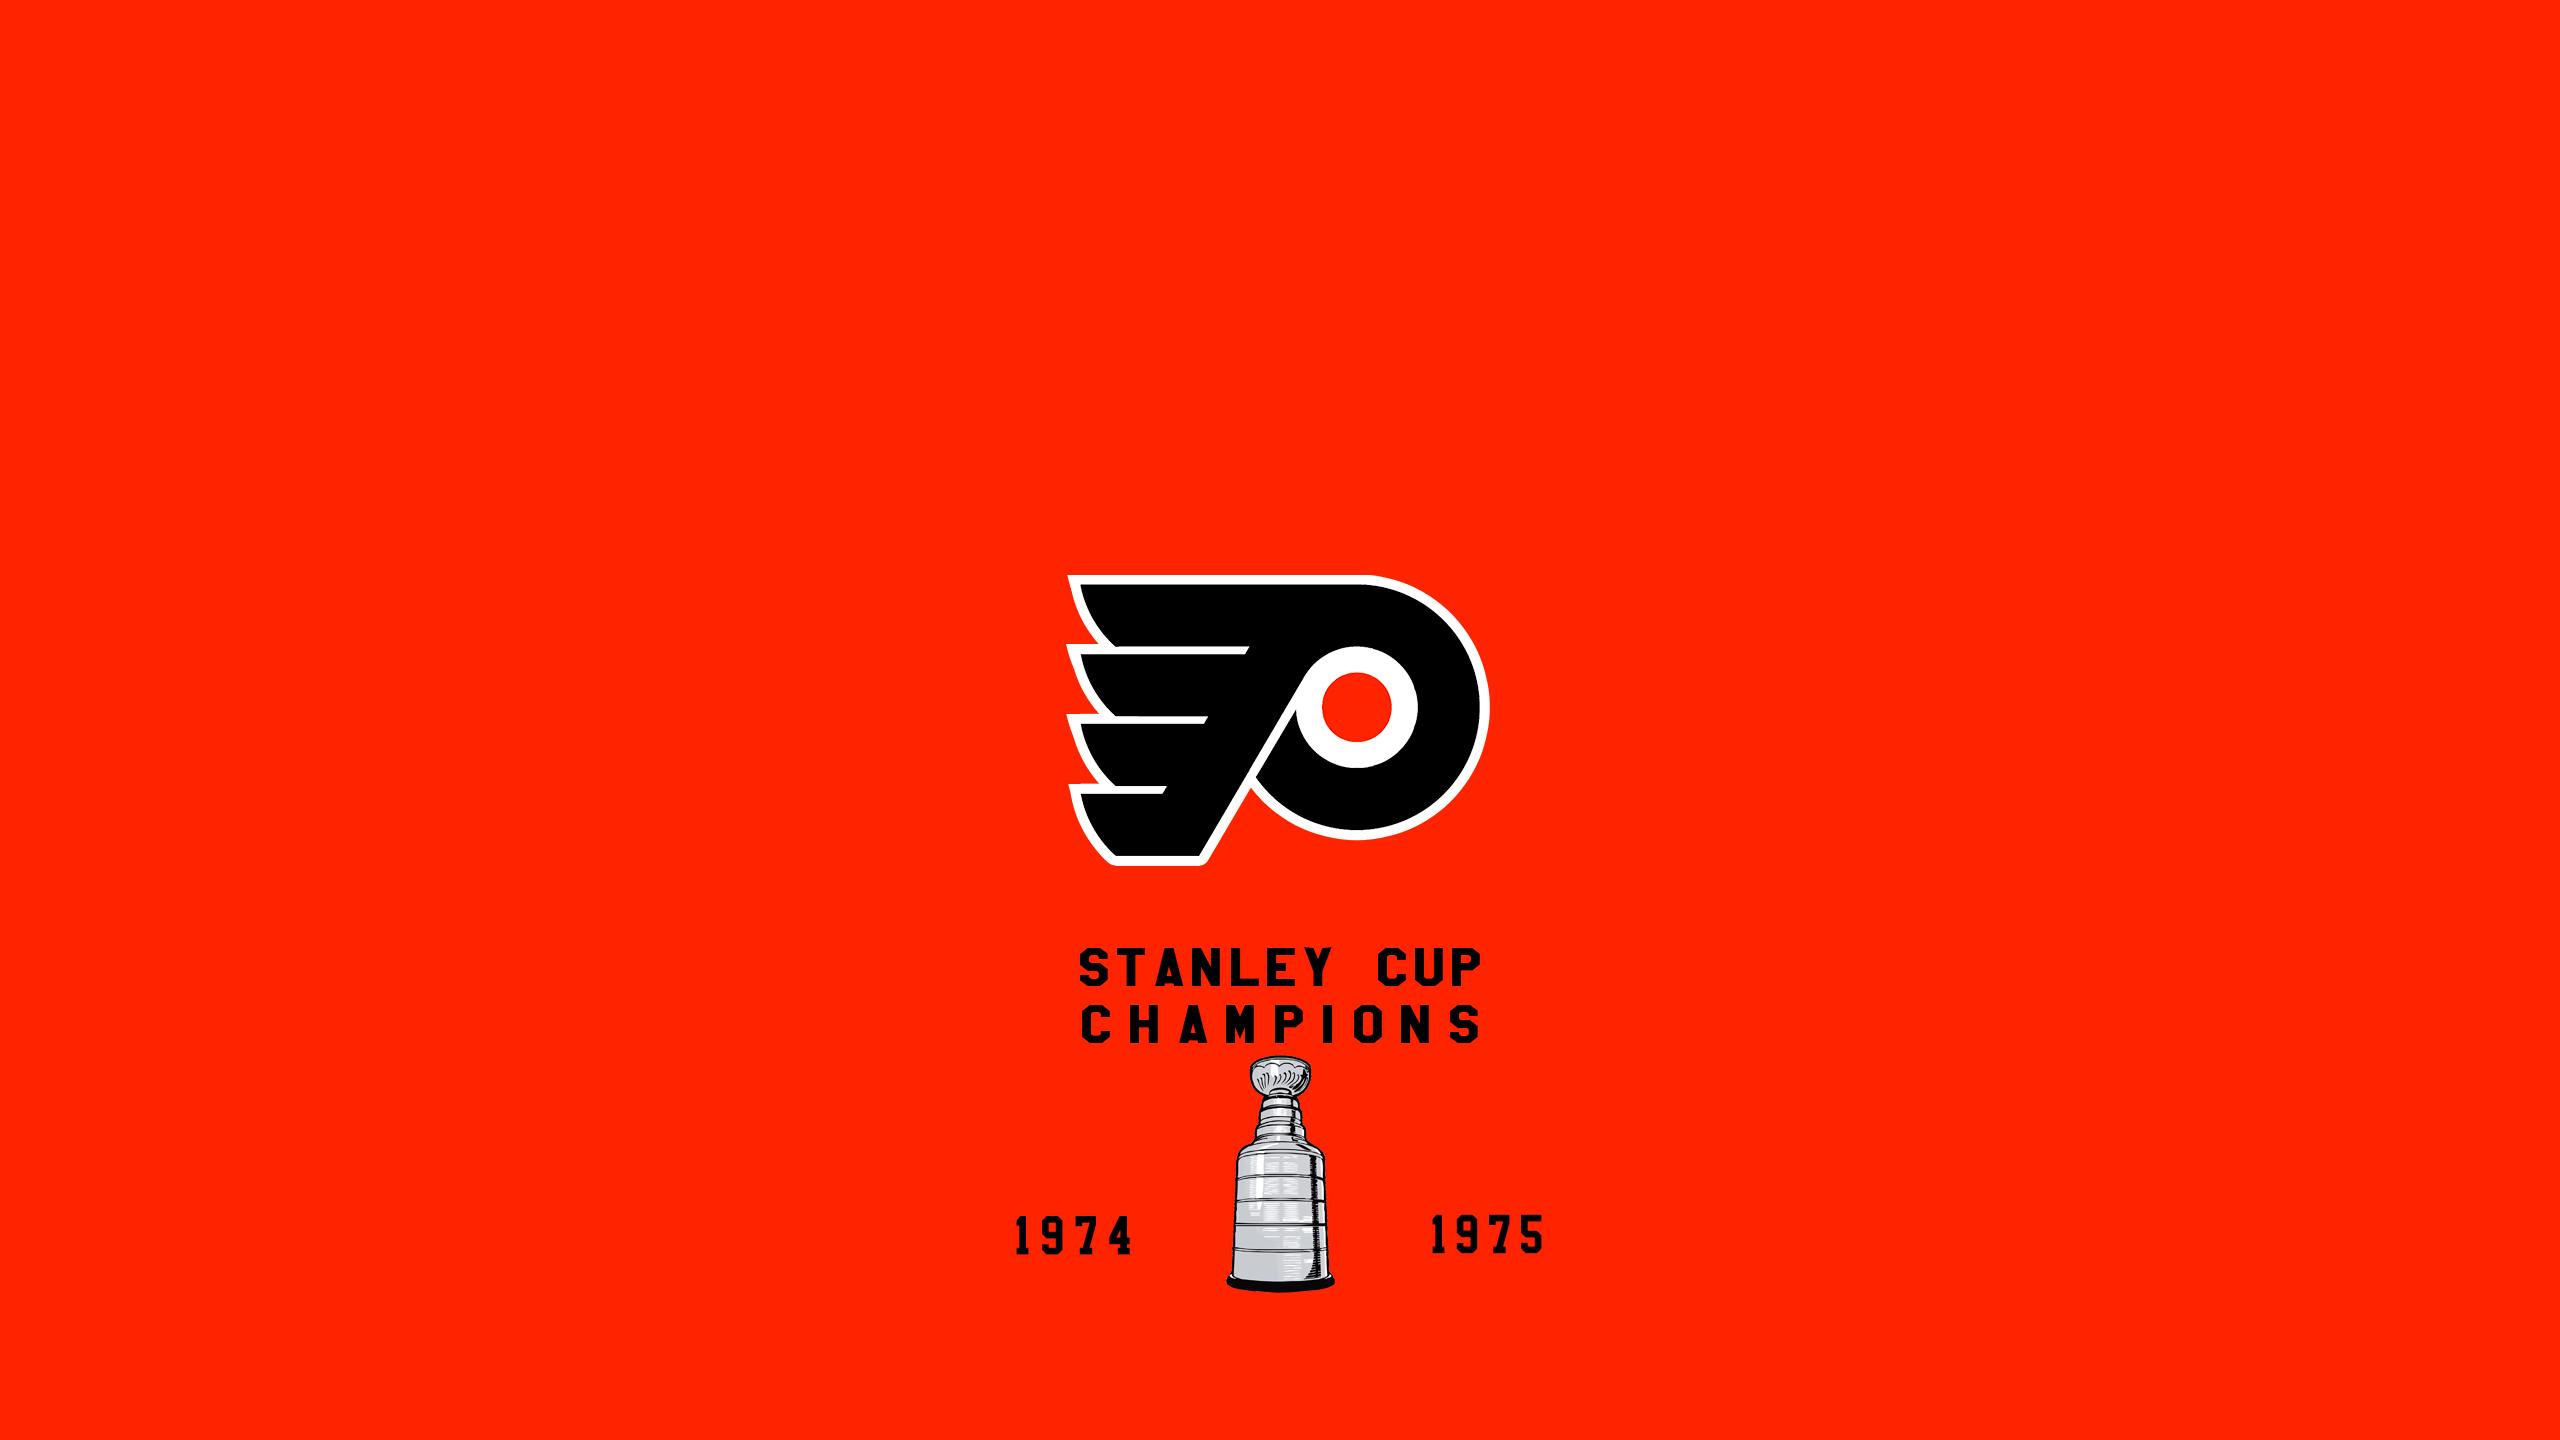 Philadelphia Flyers - Stanley Cup